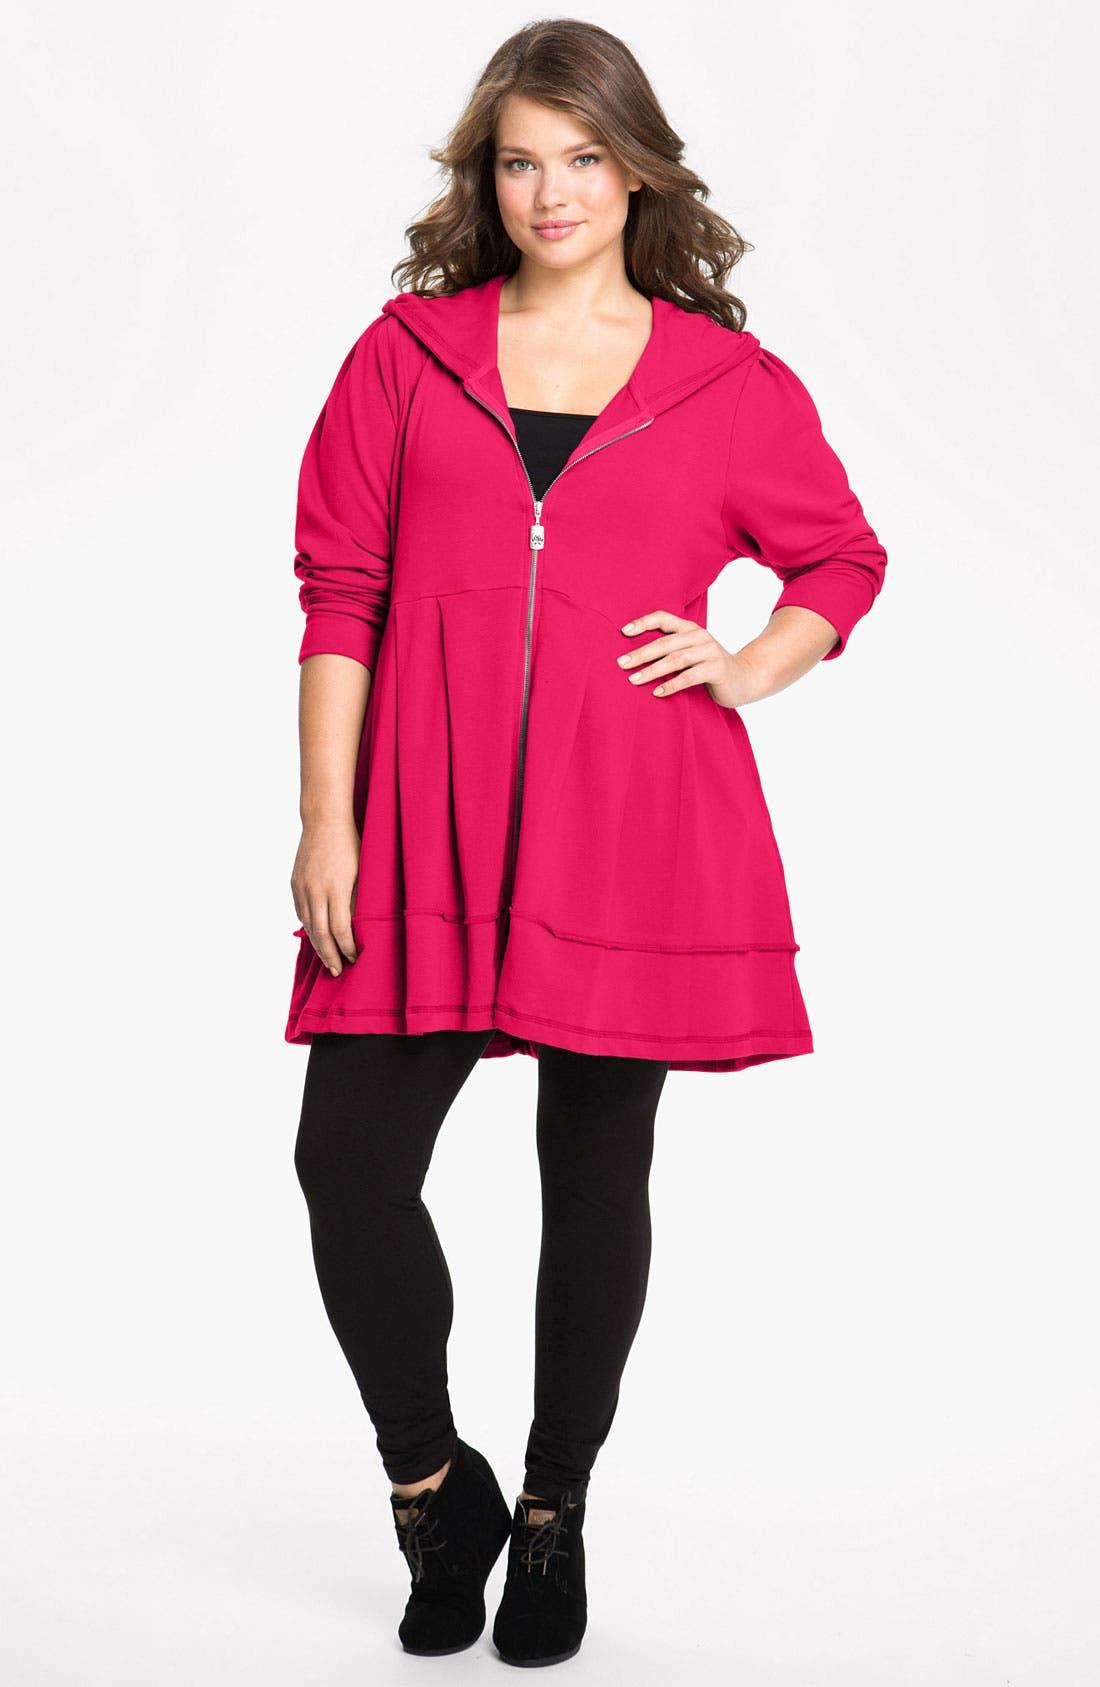 Alternate Image 1 Selected - Pink Lotus Pleated Tunic Hoodie (Plus Size)